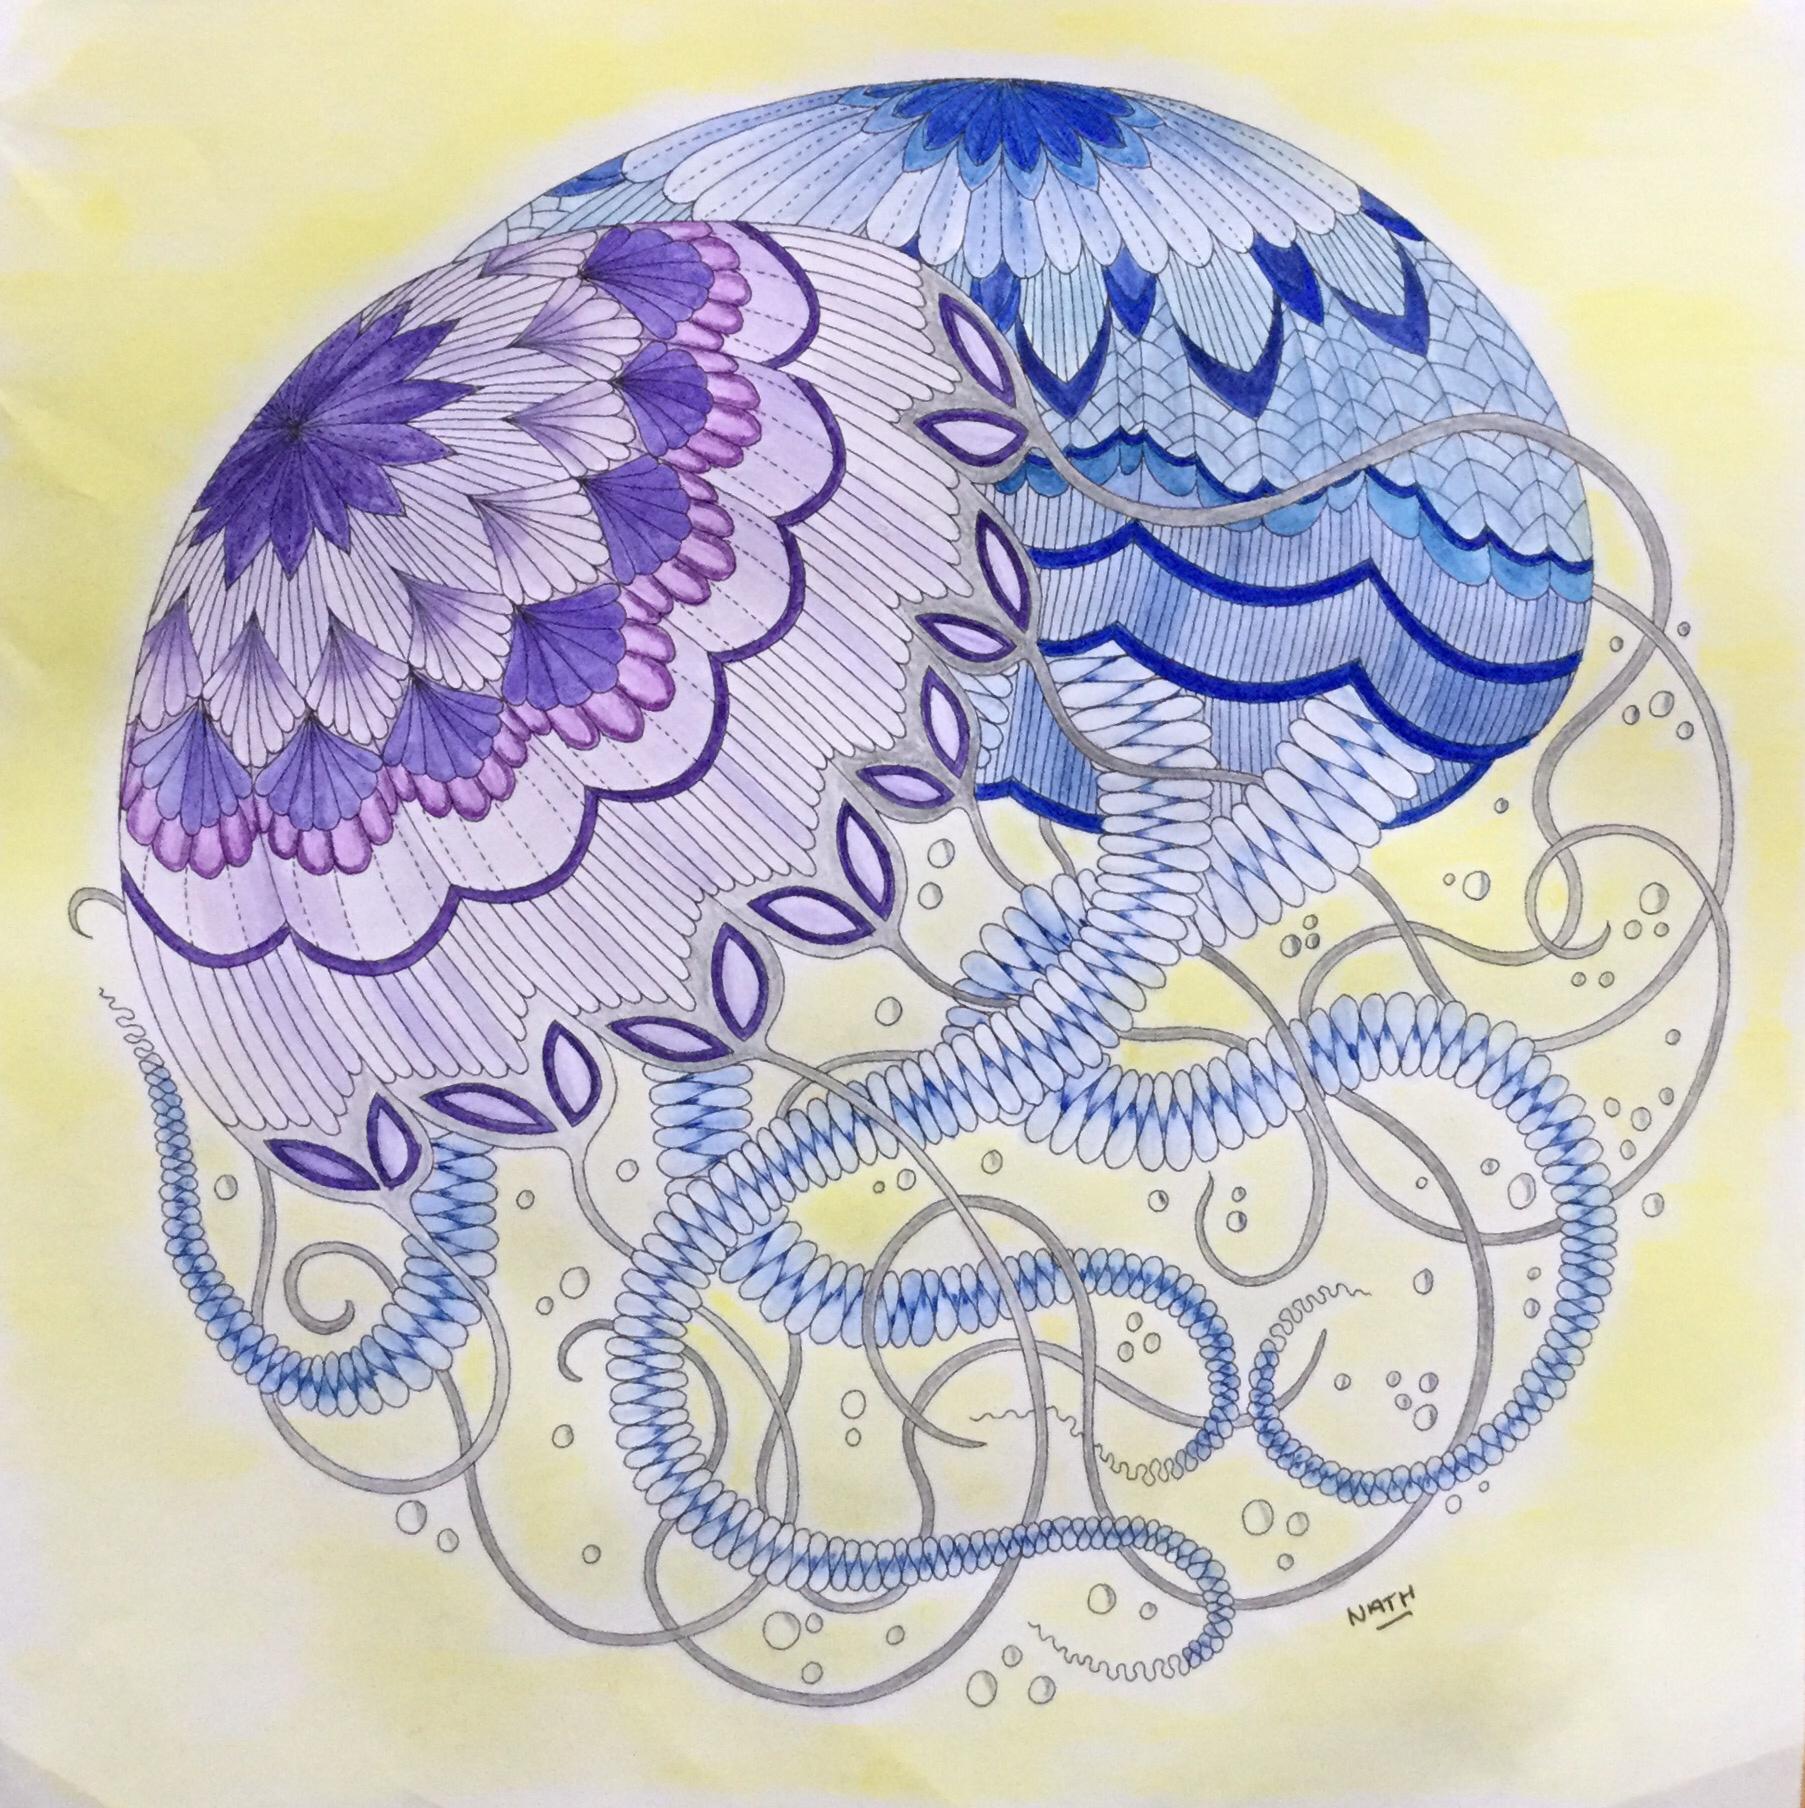 Drawn jellies millie marotta Colouring Pinterest Colouring Colouring Marotta